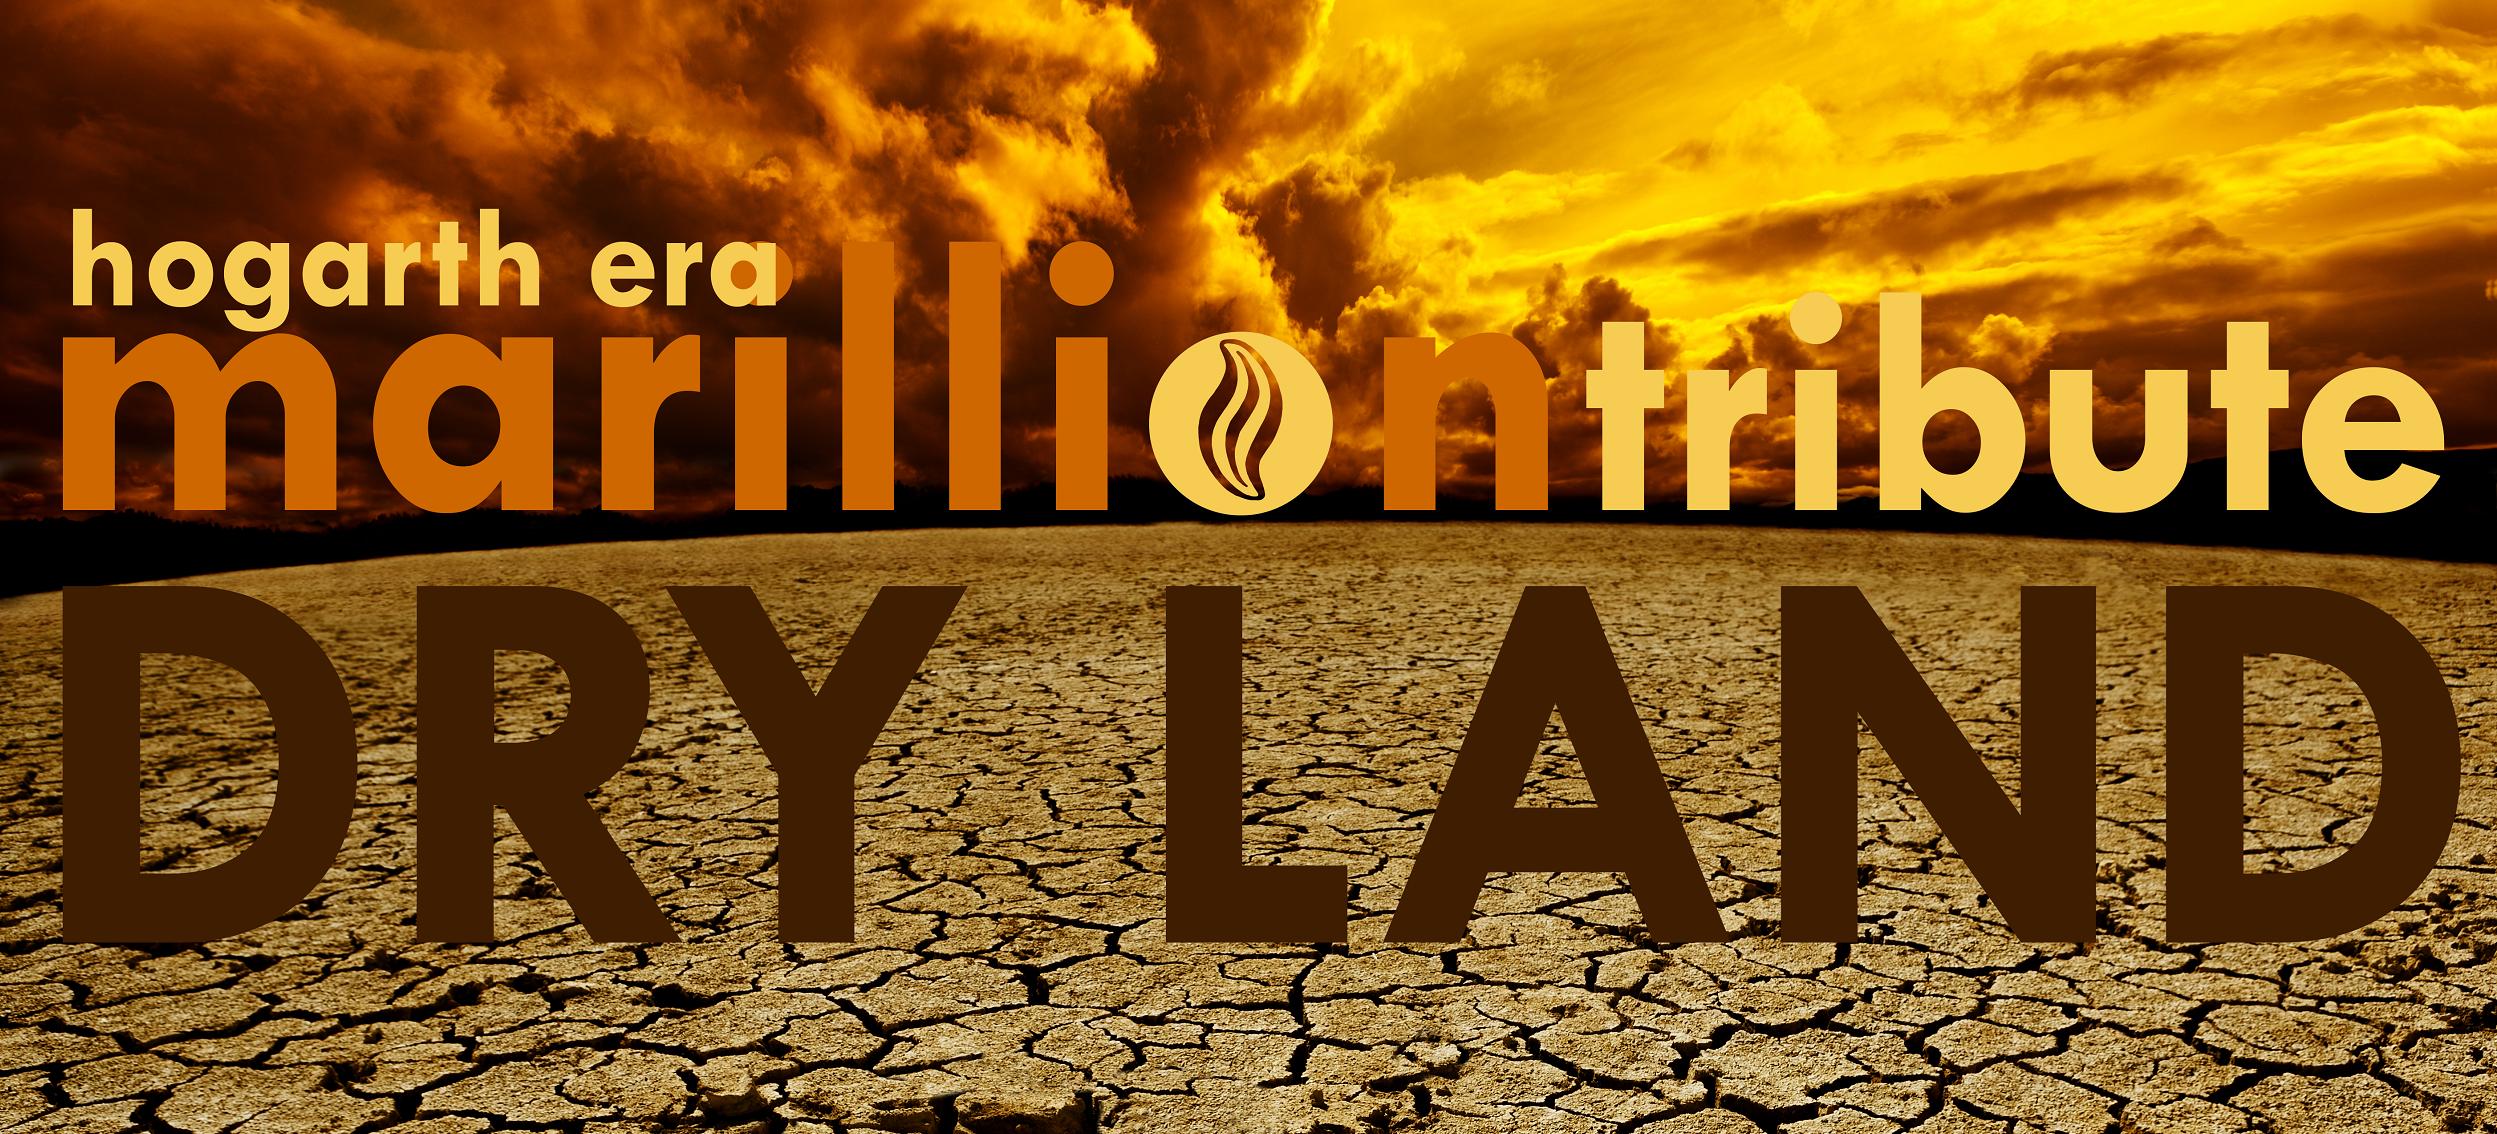 Dryland Marillion Tribute